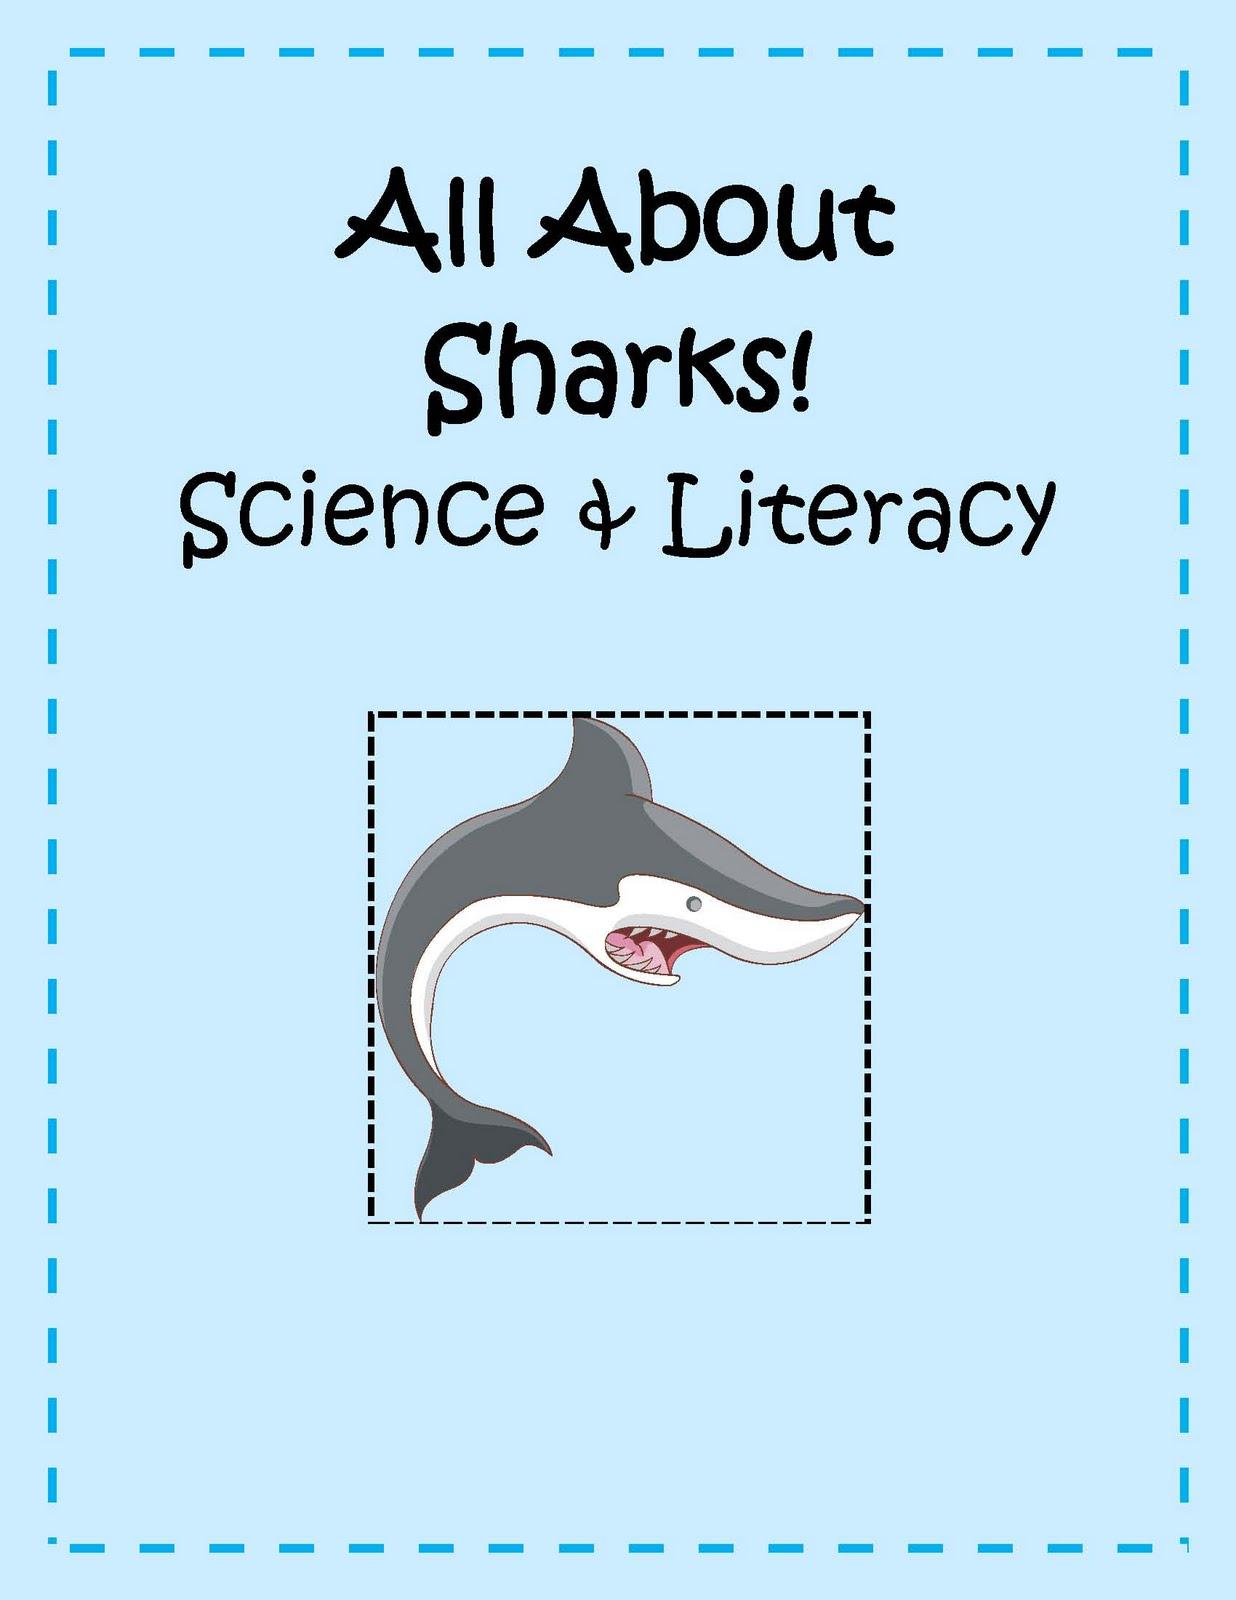 Little Miss Middle School Middle School Shark Lesson